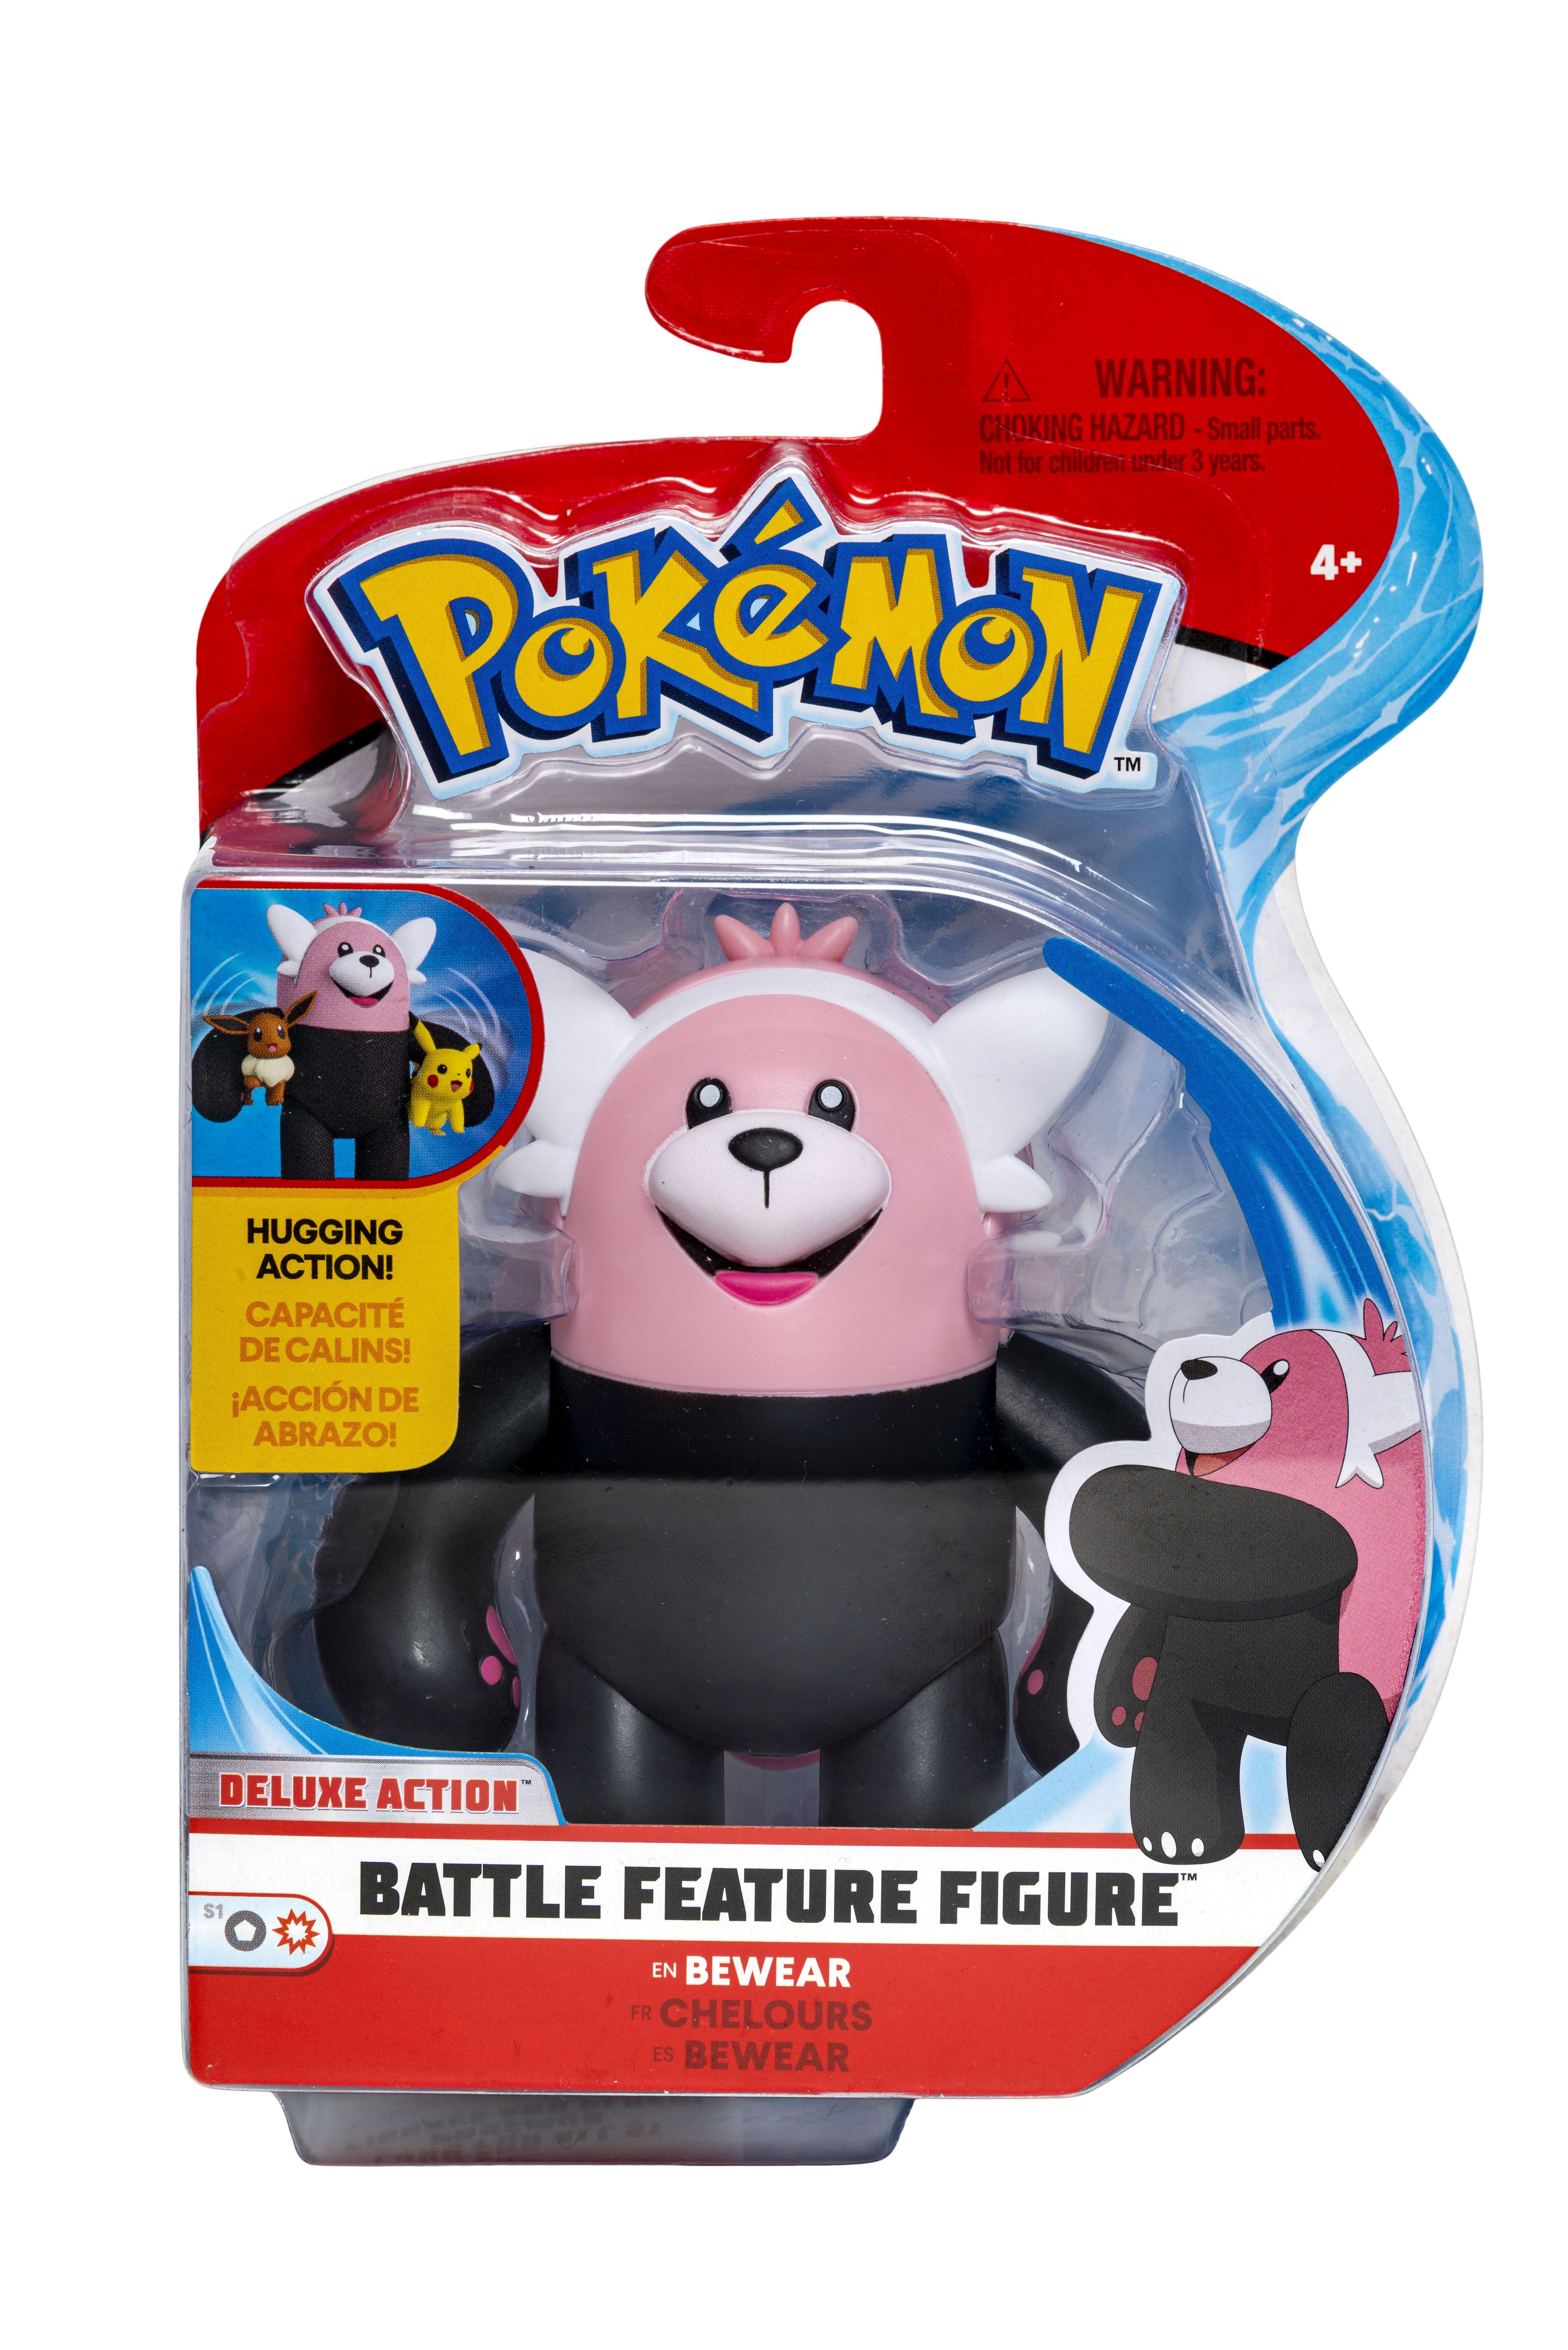 Pokémon - Battle Feature Figur - Kosturso